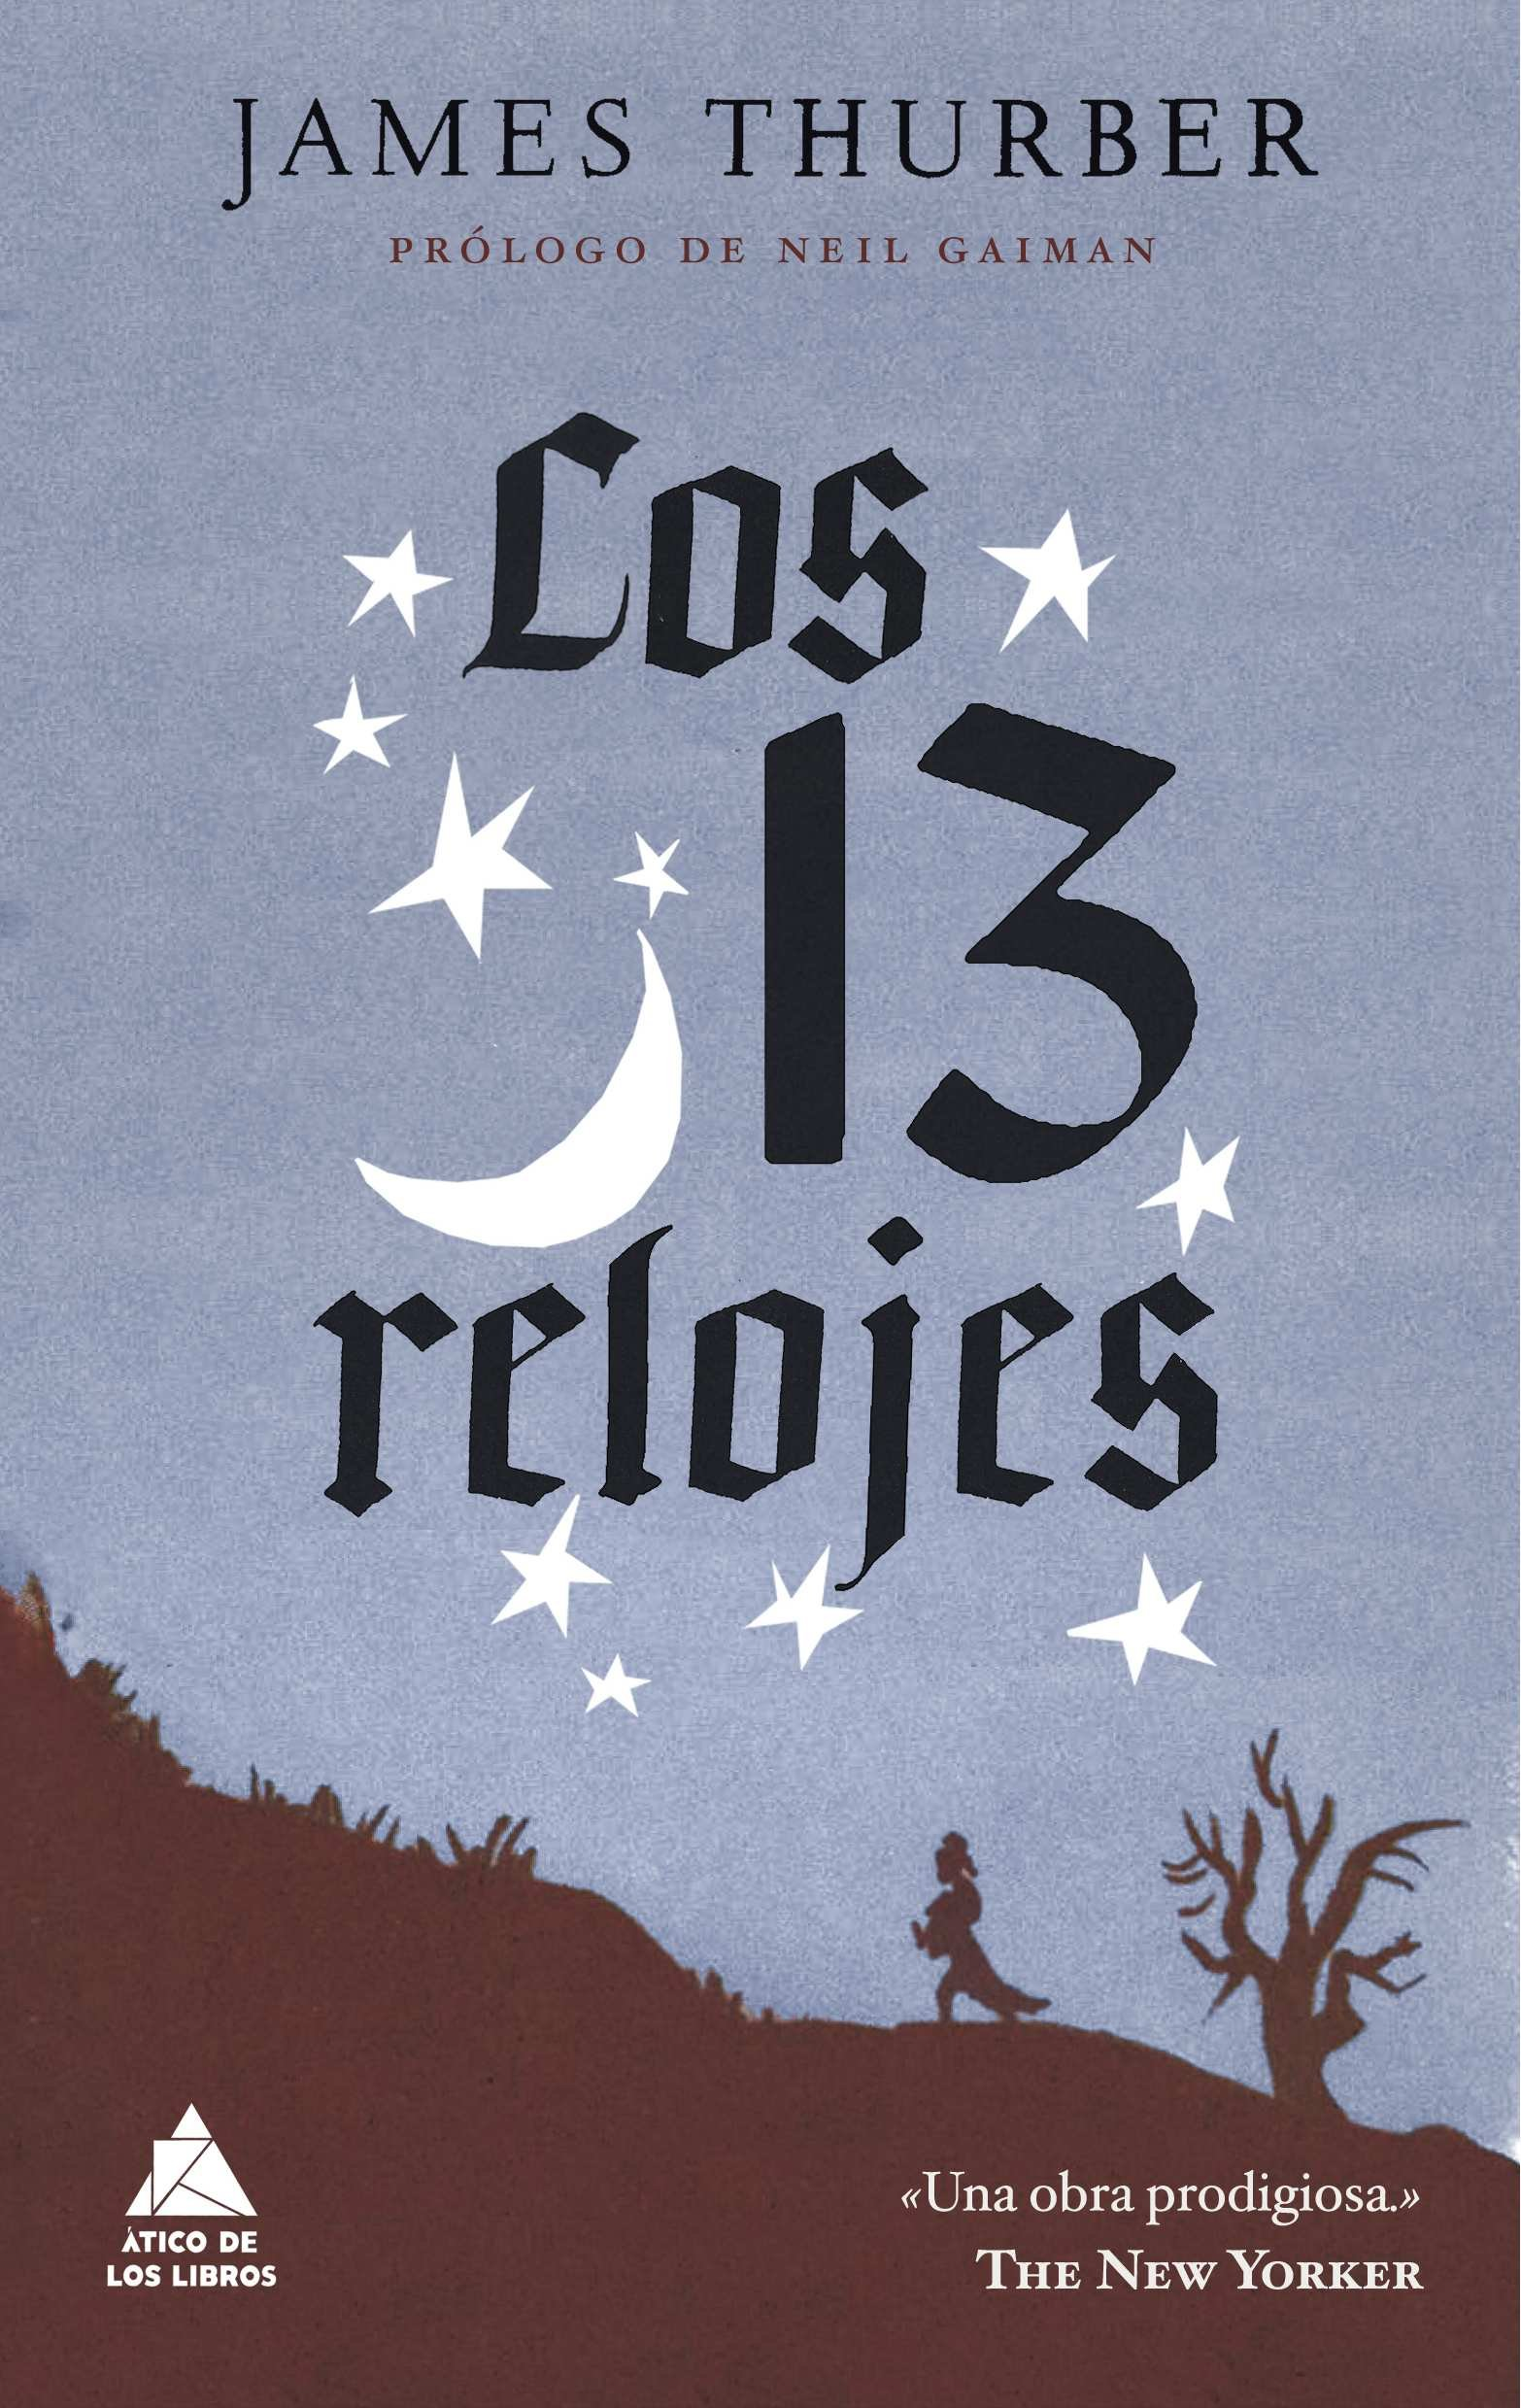 Los 13 relojes (Spanish Edition) (Spanish) Paperback – May 10, 2010